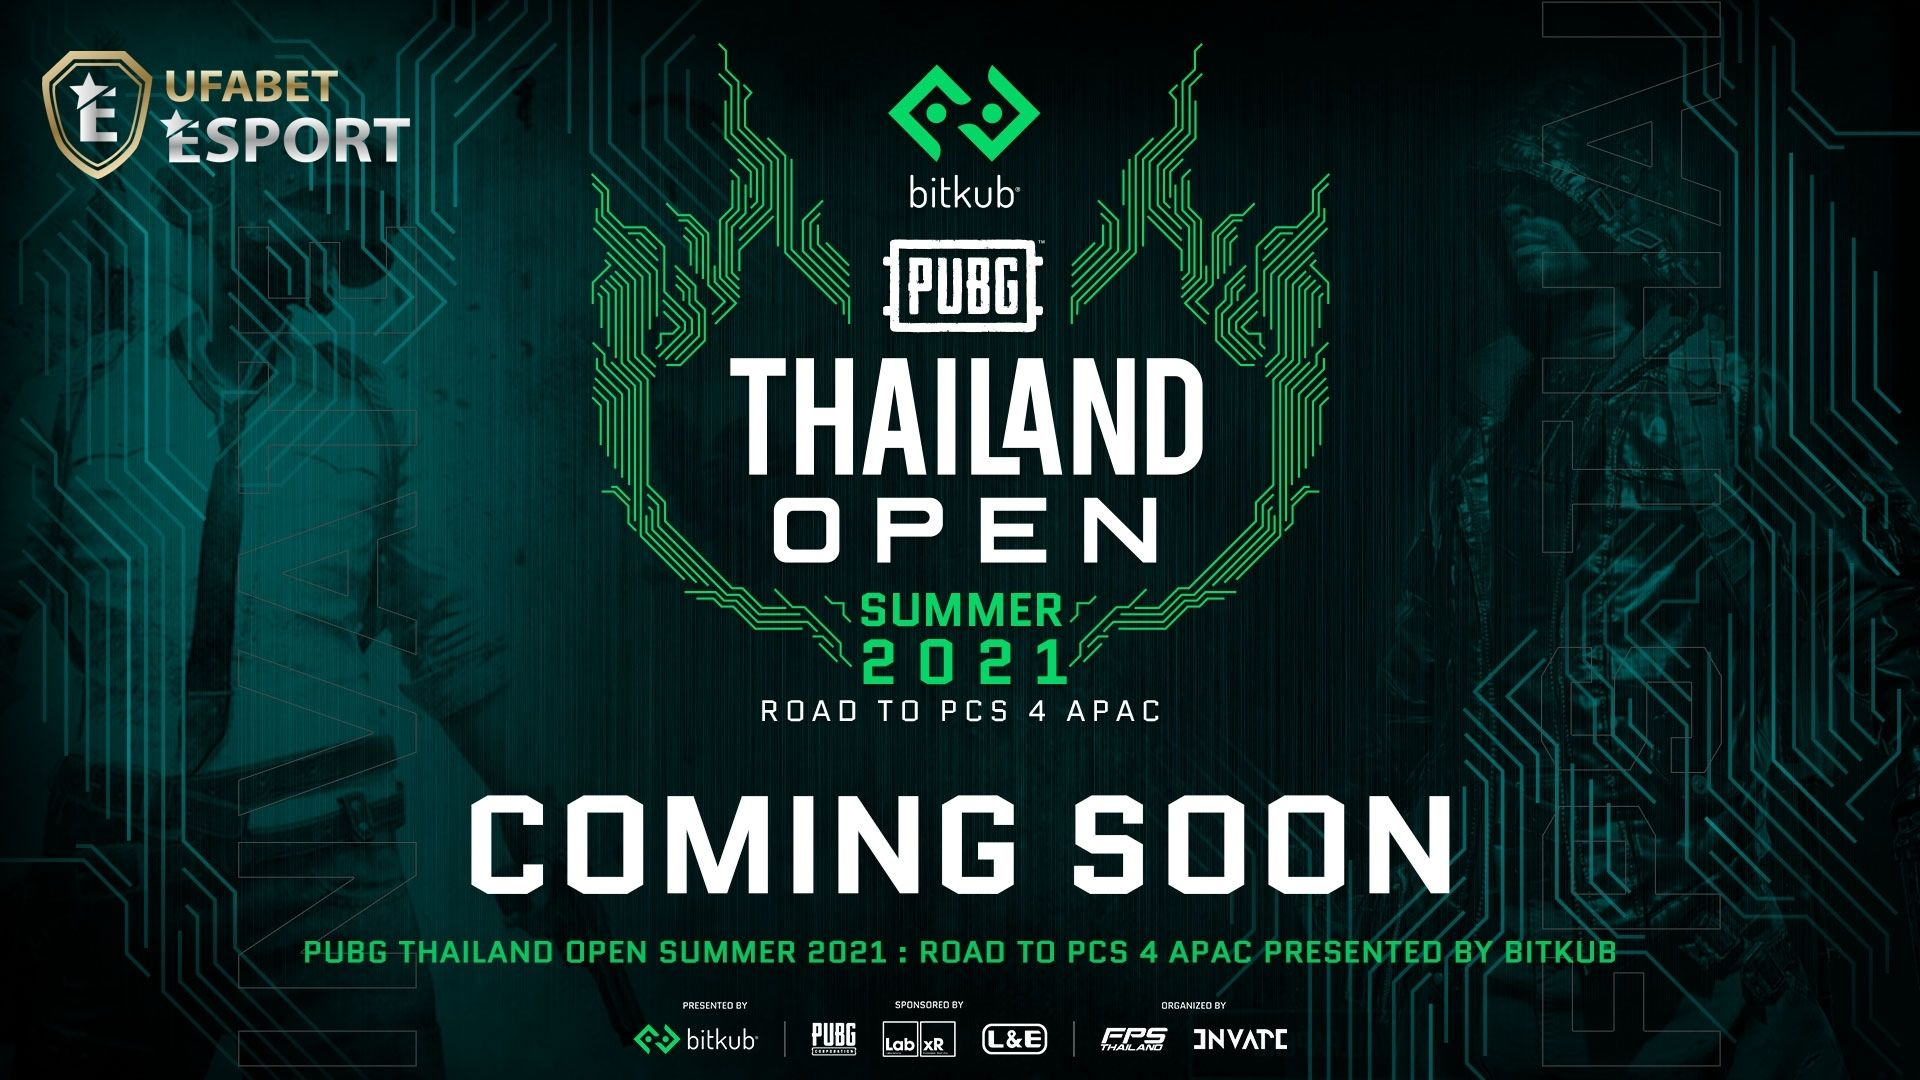 PUBG Thailand Open Summer 2021 : Road to PCS 4 APAC